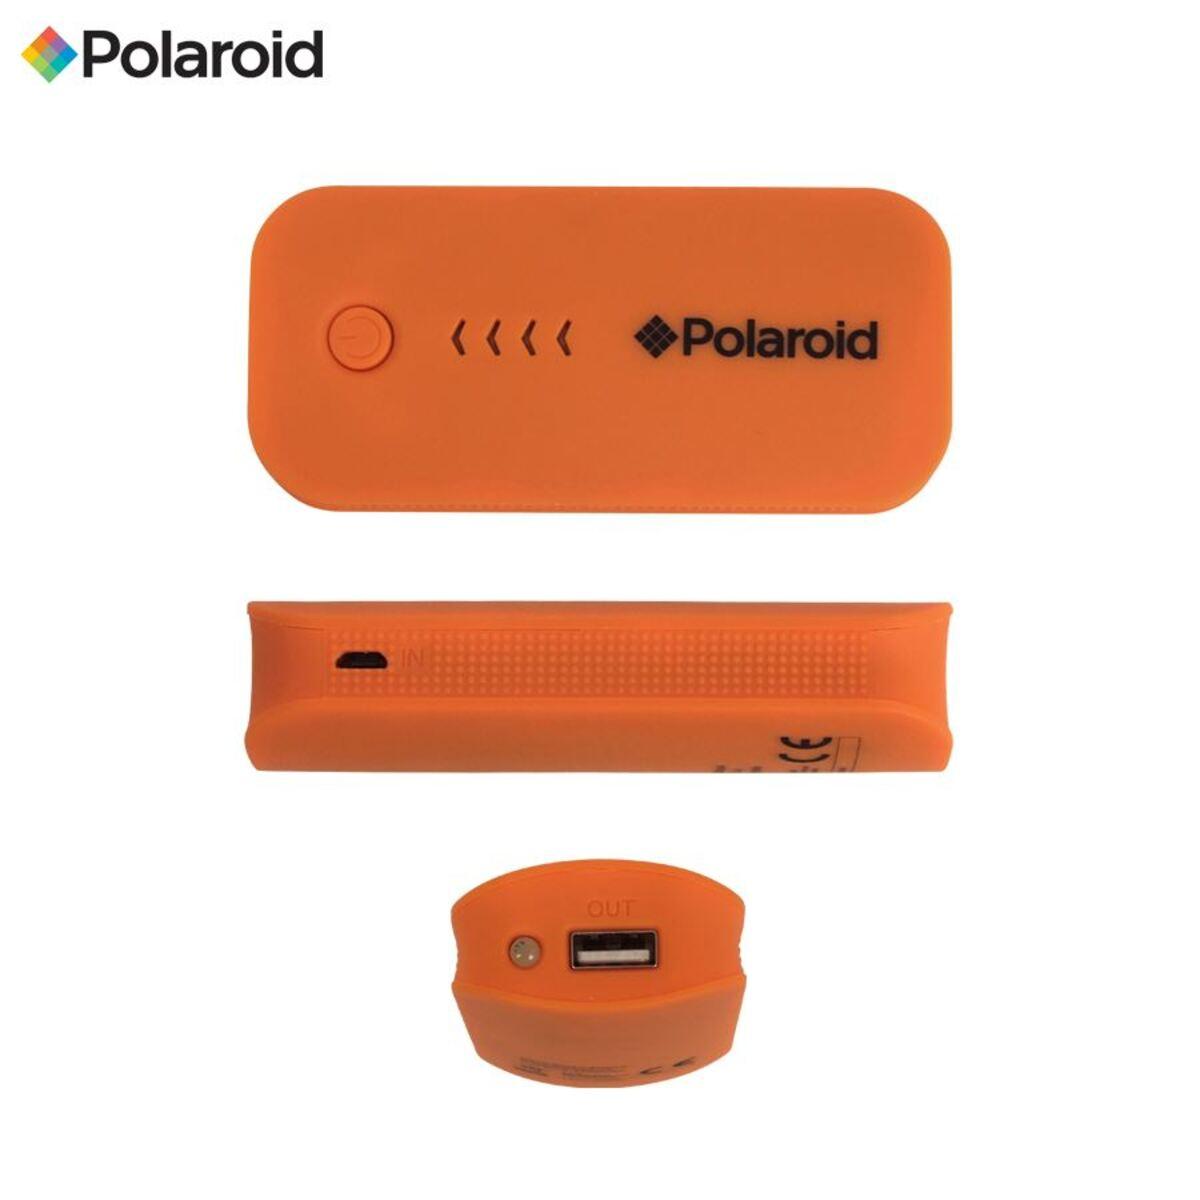 Bild 2 von Polaroid Power Bank Mobiler Akku-Pack 4000mAh Orange